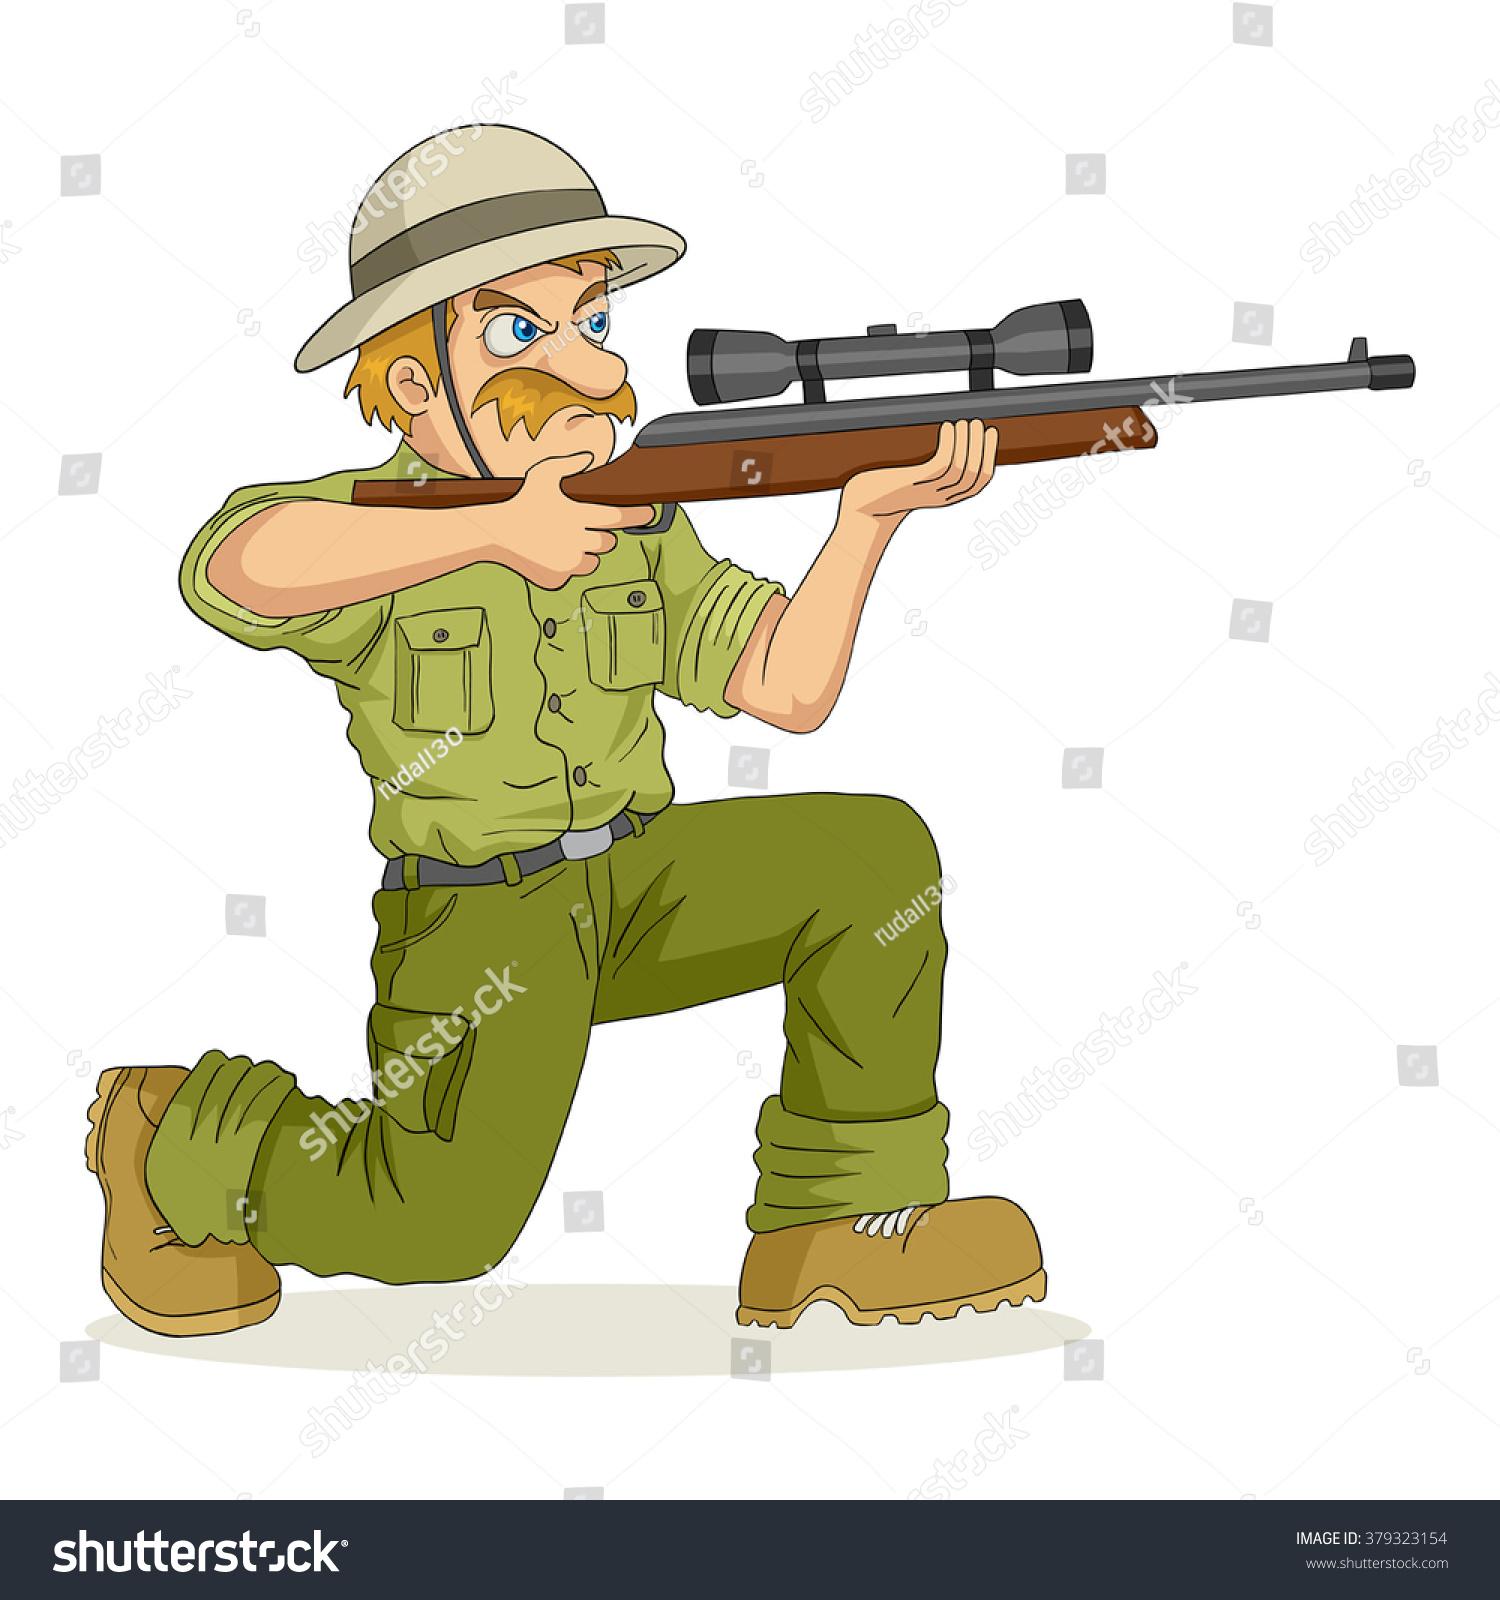 Rifle cartoon cartoon illustration of a hunter aiming a rifle